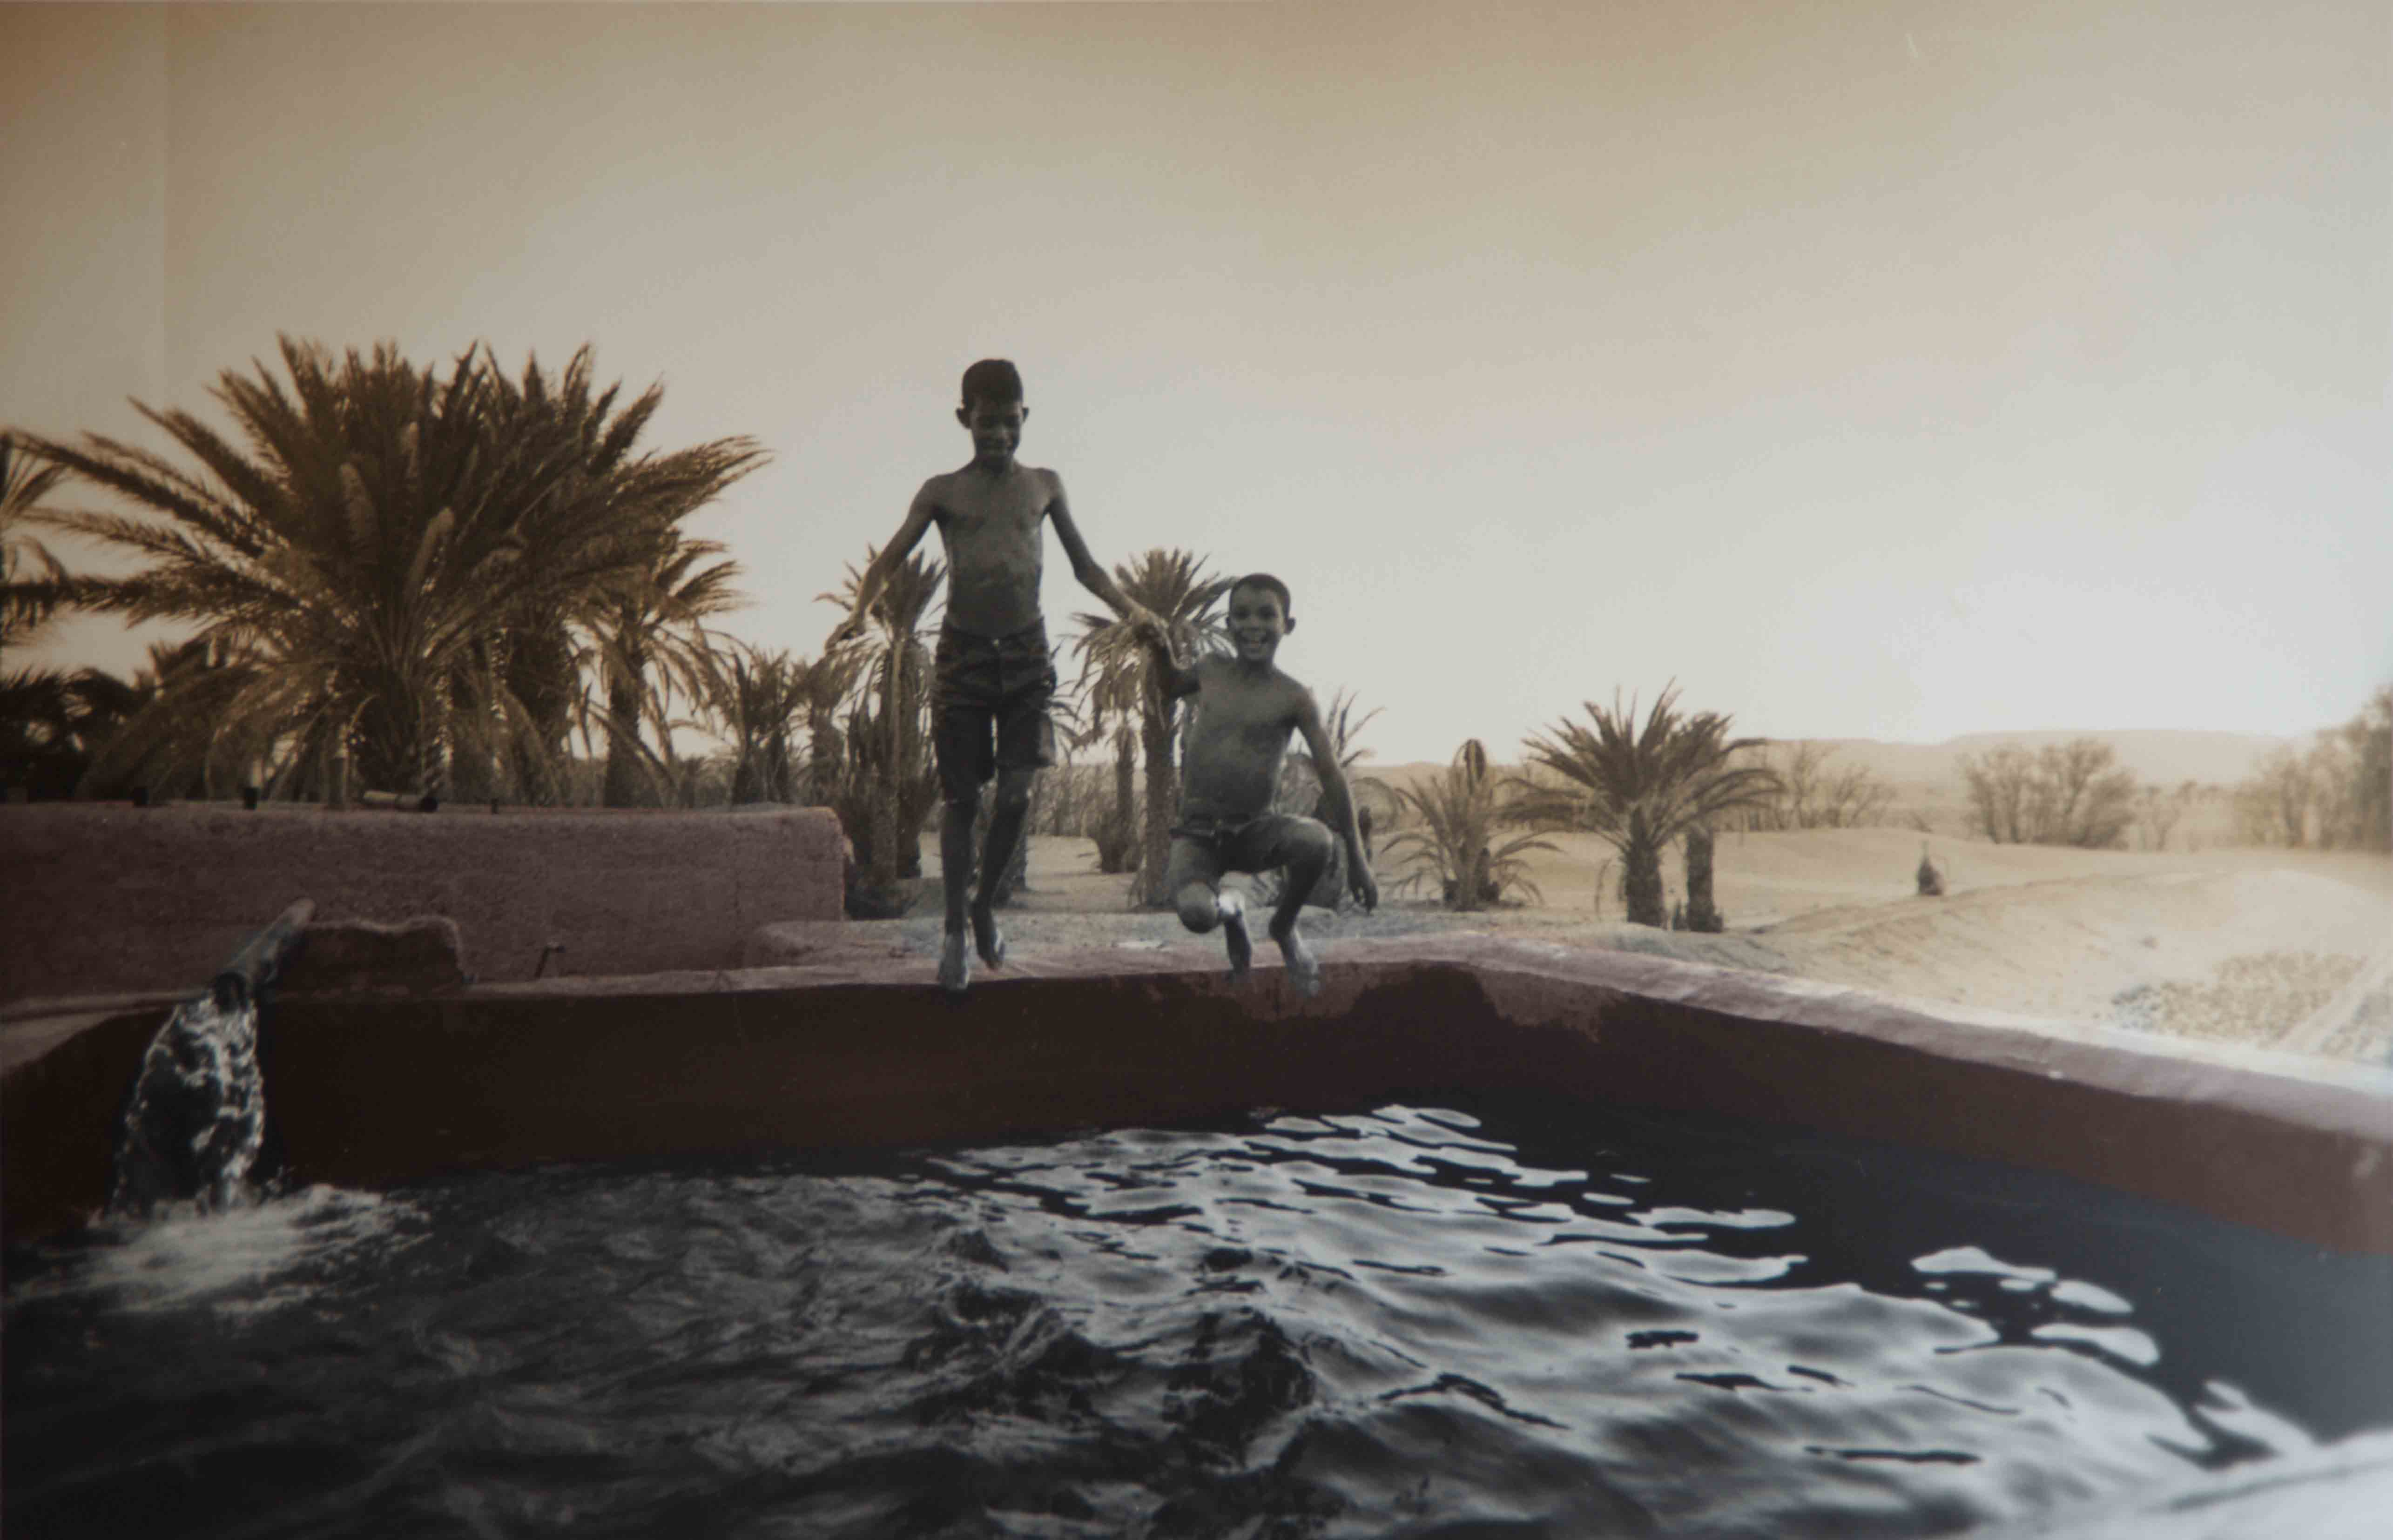 Reservoir d'eau dans an oasis, Moroc, 2001<br/>Impresión de tintas de pigmentos / Inkjet